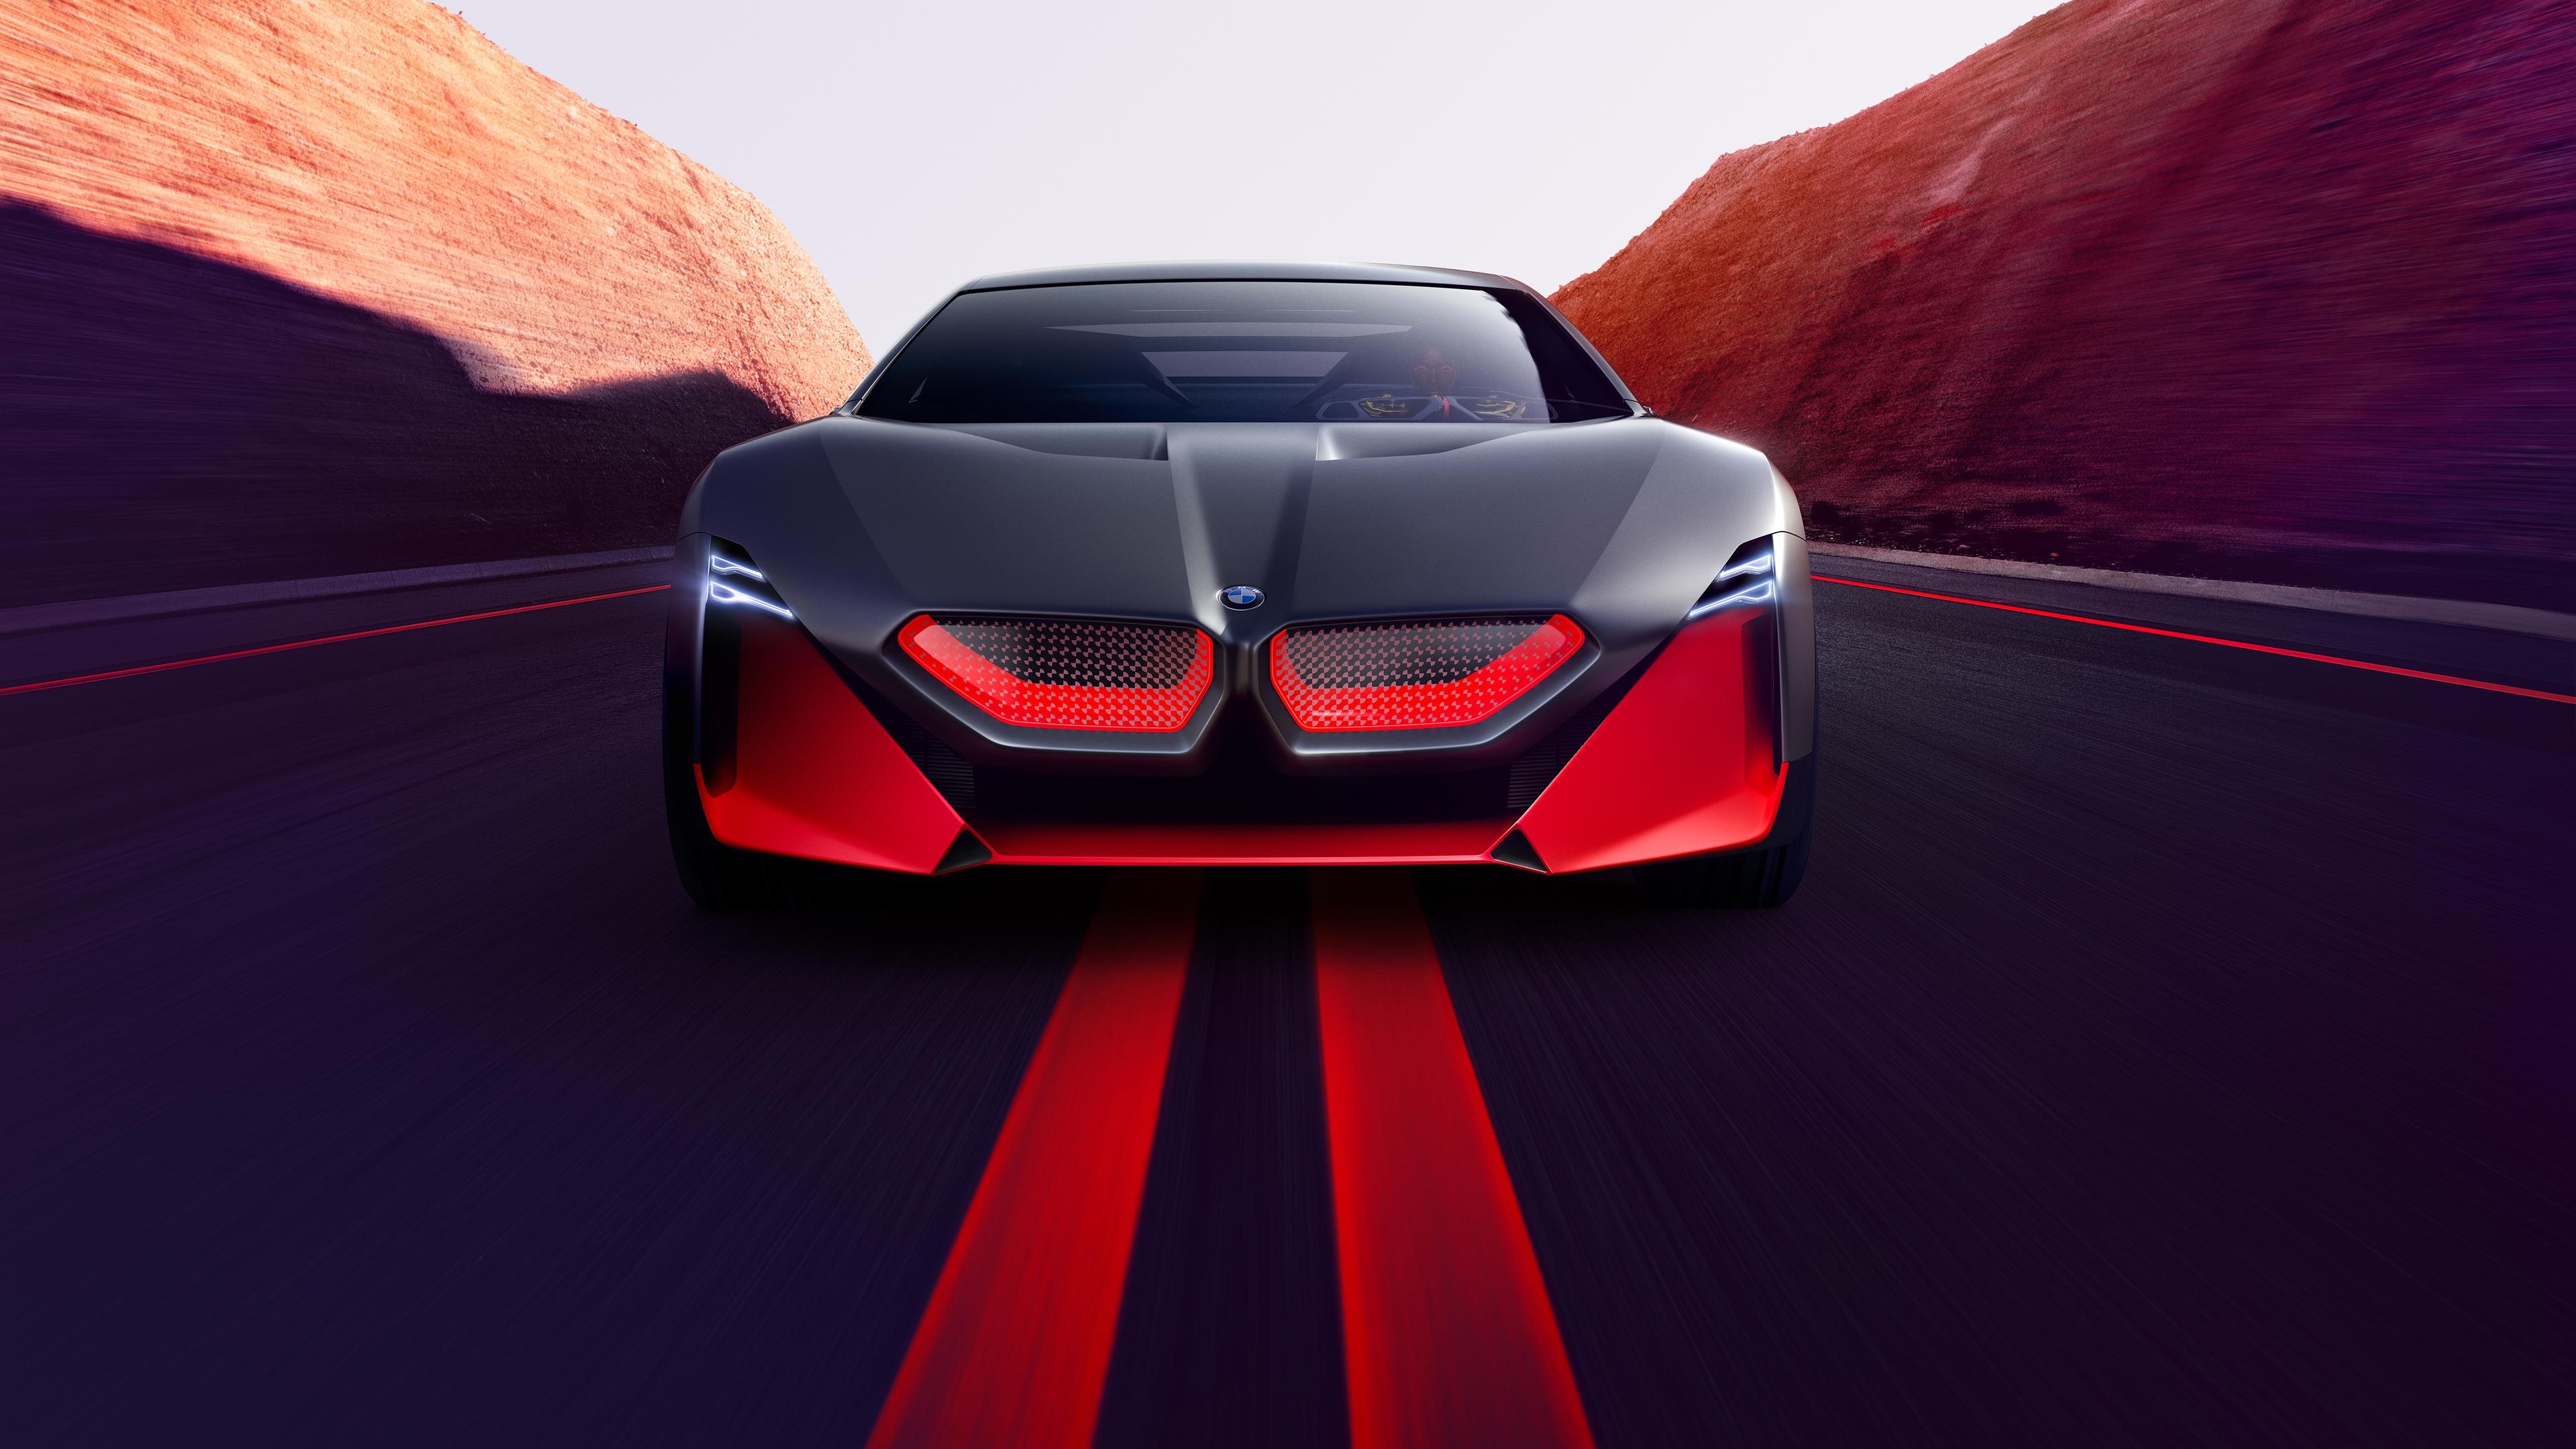 bmw vision m next 2019 1563221079 - BMW Vision M NEXT 2019 - hd-wallpapers, concept cars wallpapers, cars wallpapers, bmw wallpapers, bmw vision wallpapers, 4k-wallpapers